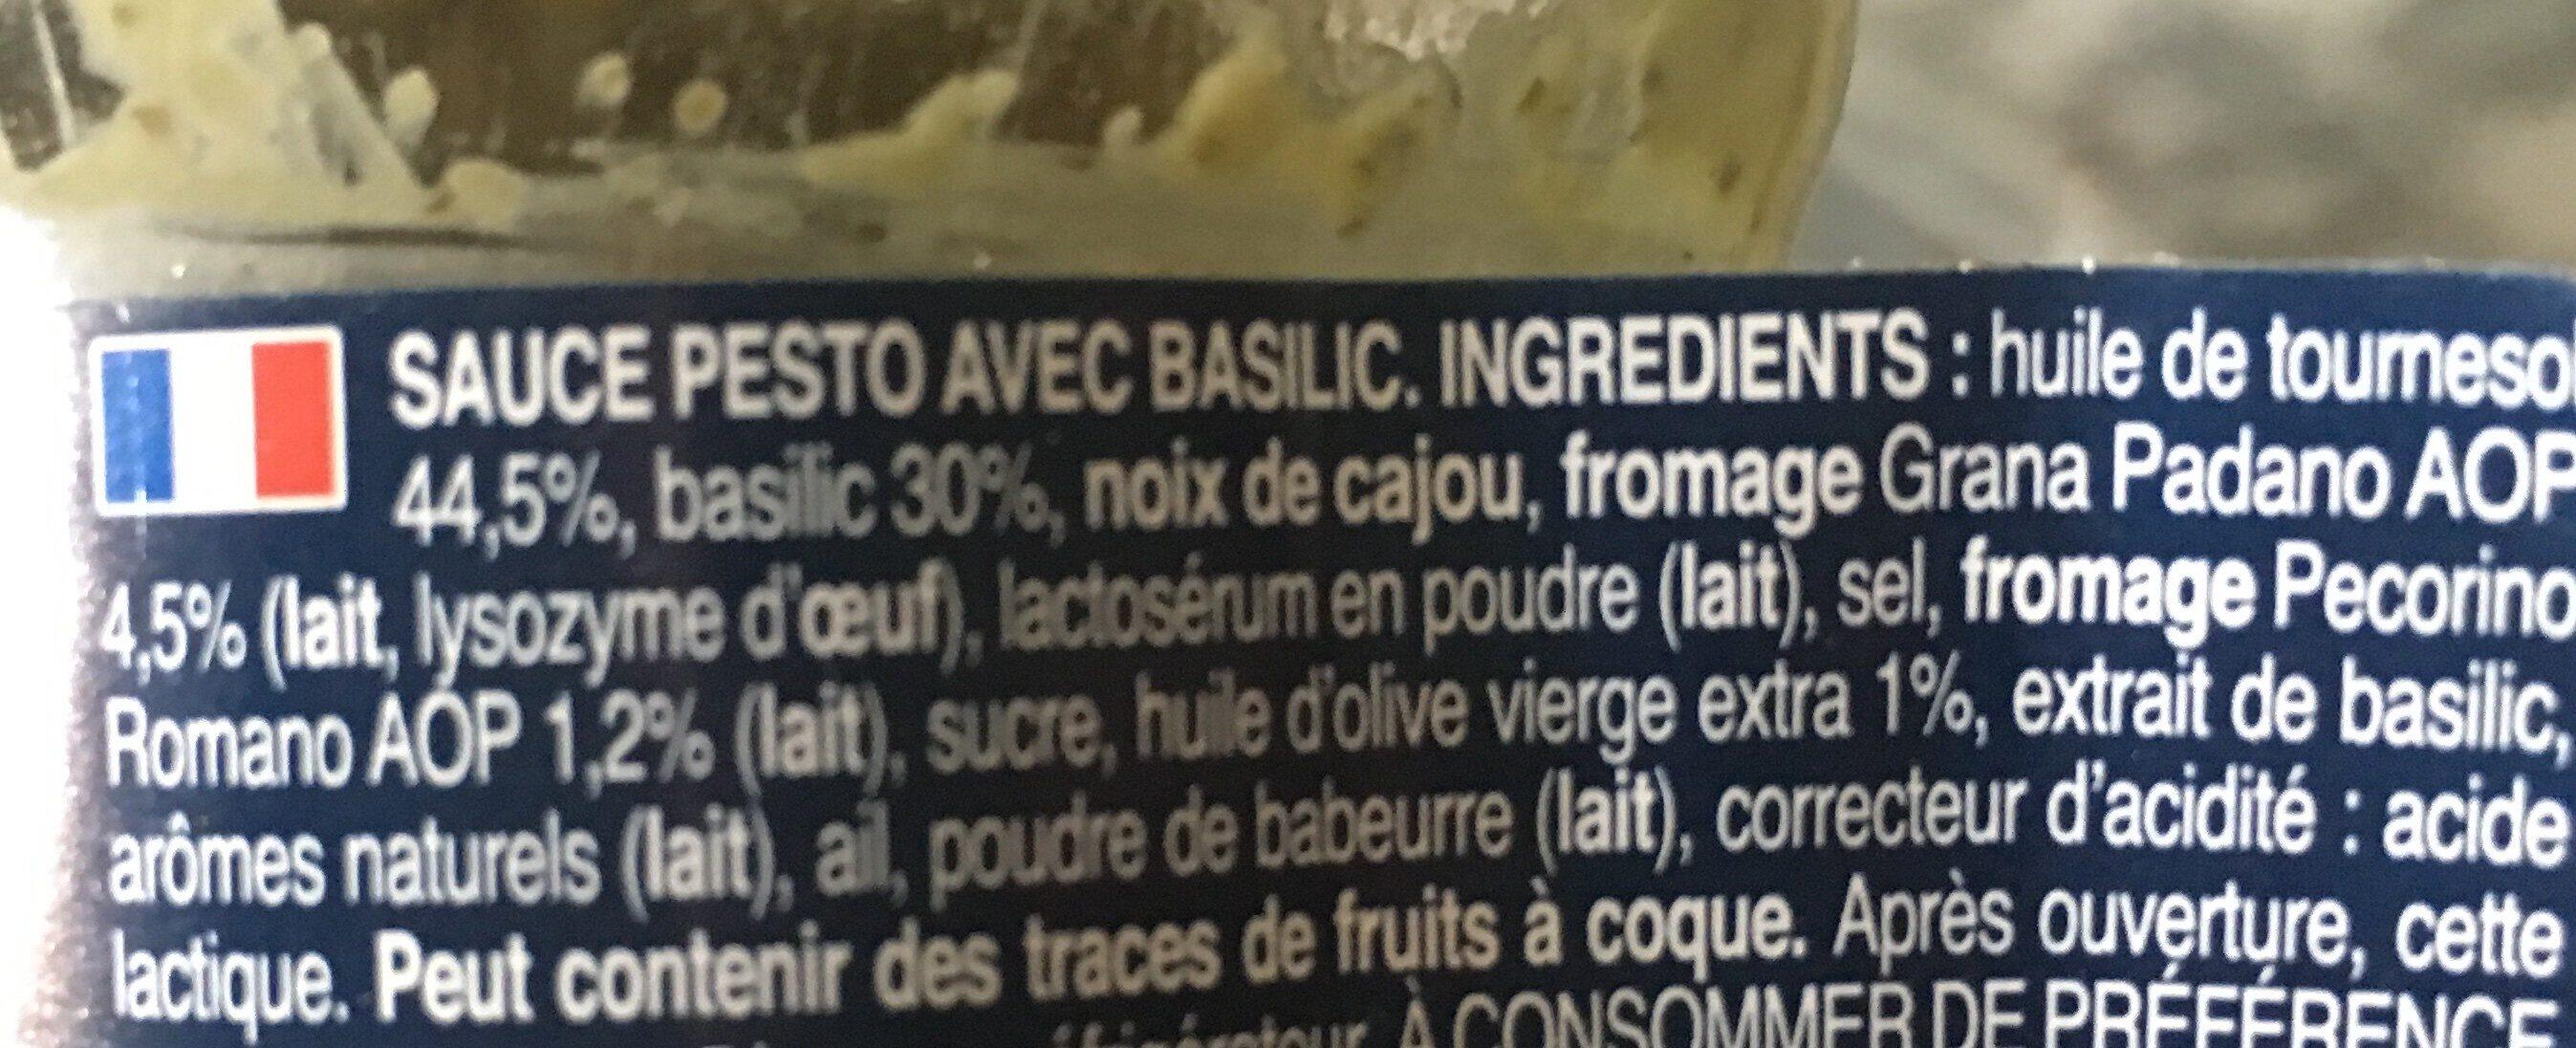 Barilla sauce pesto alla genovese basilic frais - Ingredienti - fr